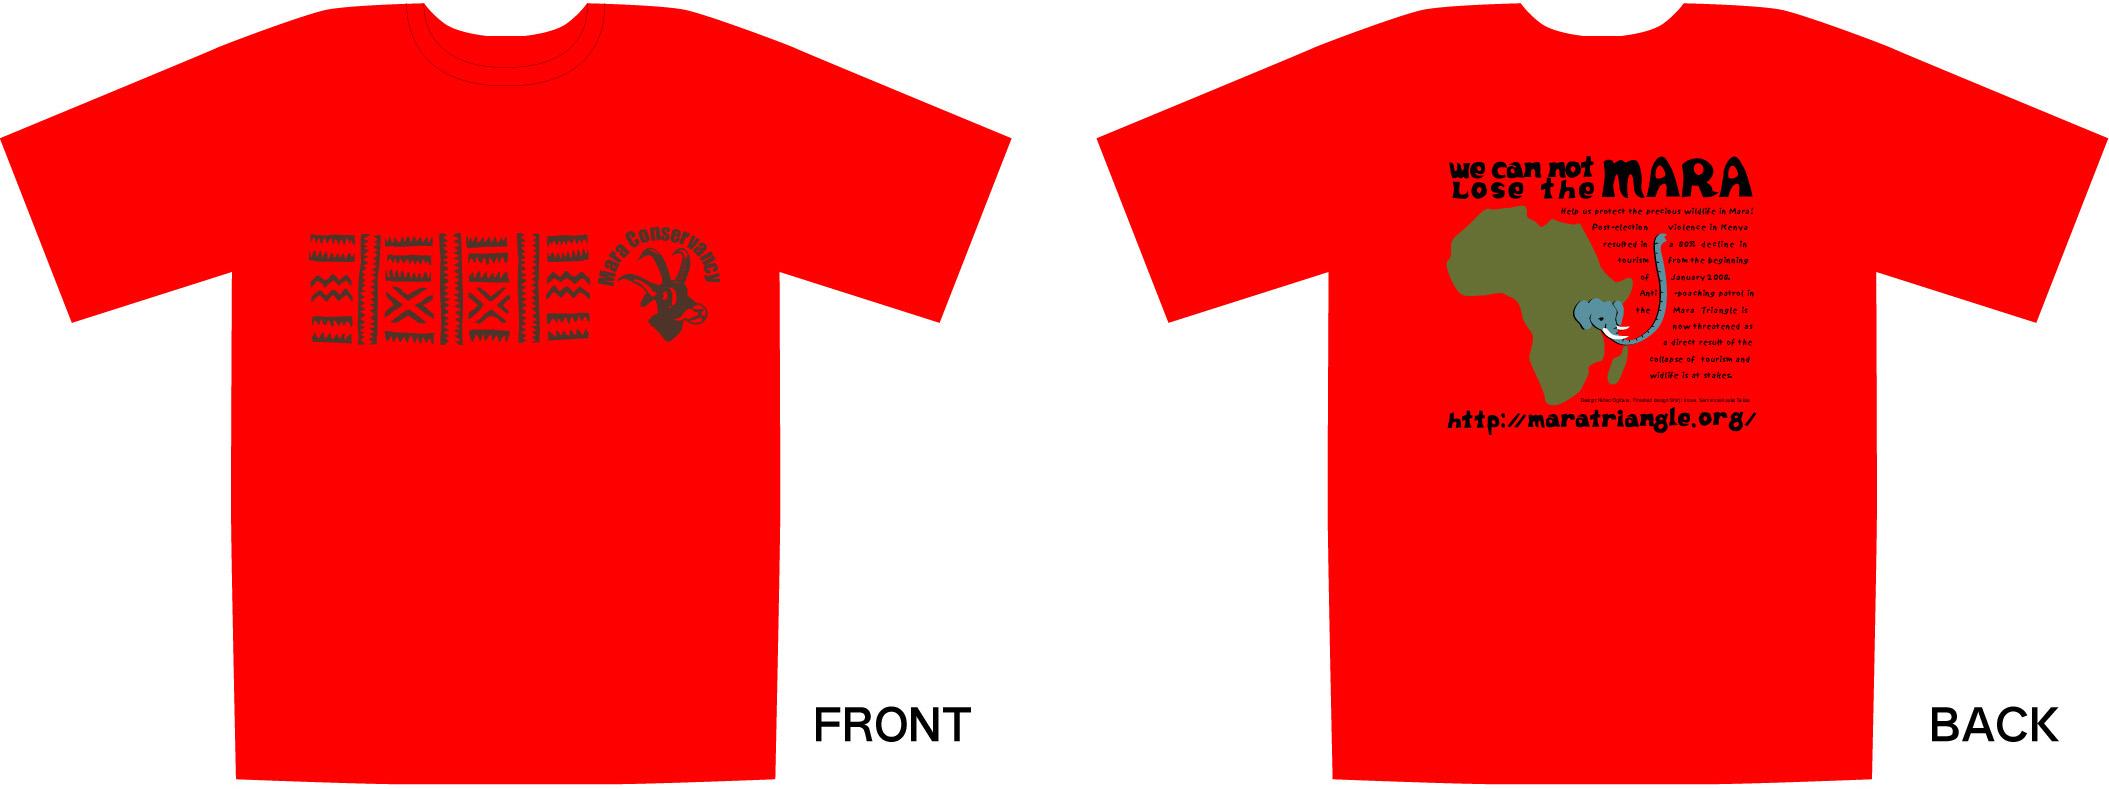 "\""WE CANNOT LOSE THE MARA"" Tシャツ\""販売_b0137038_19544125.jpg"